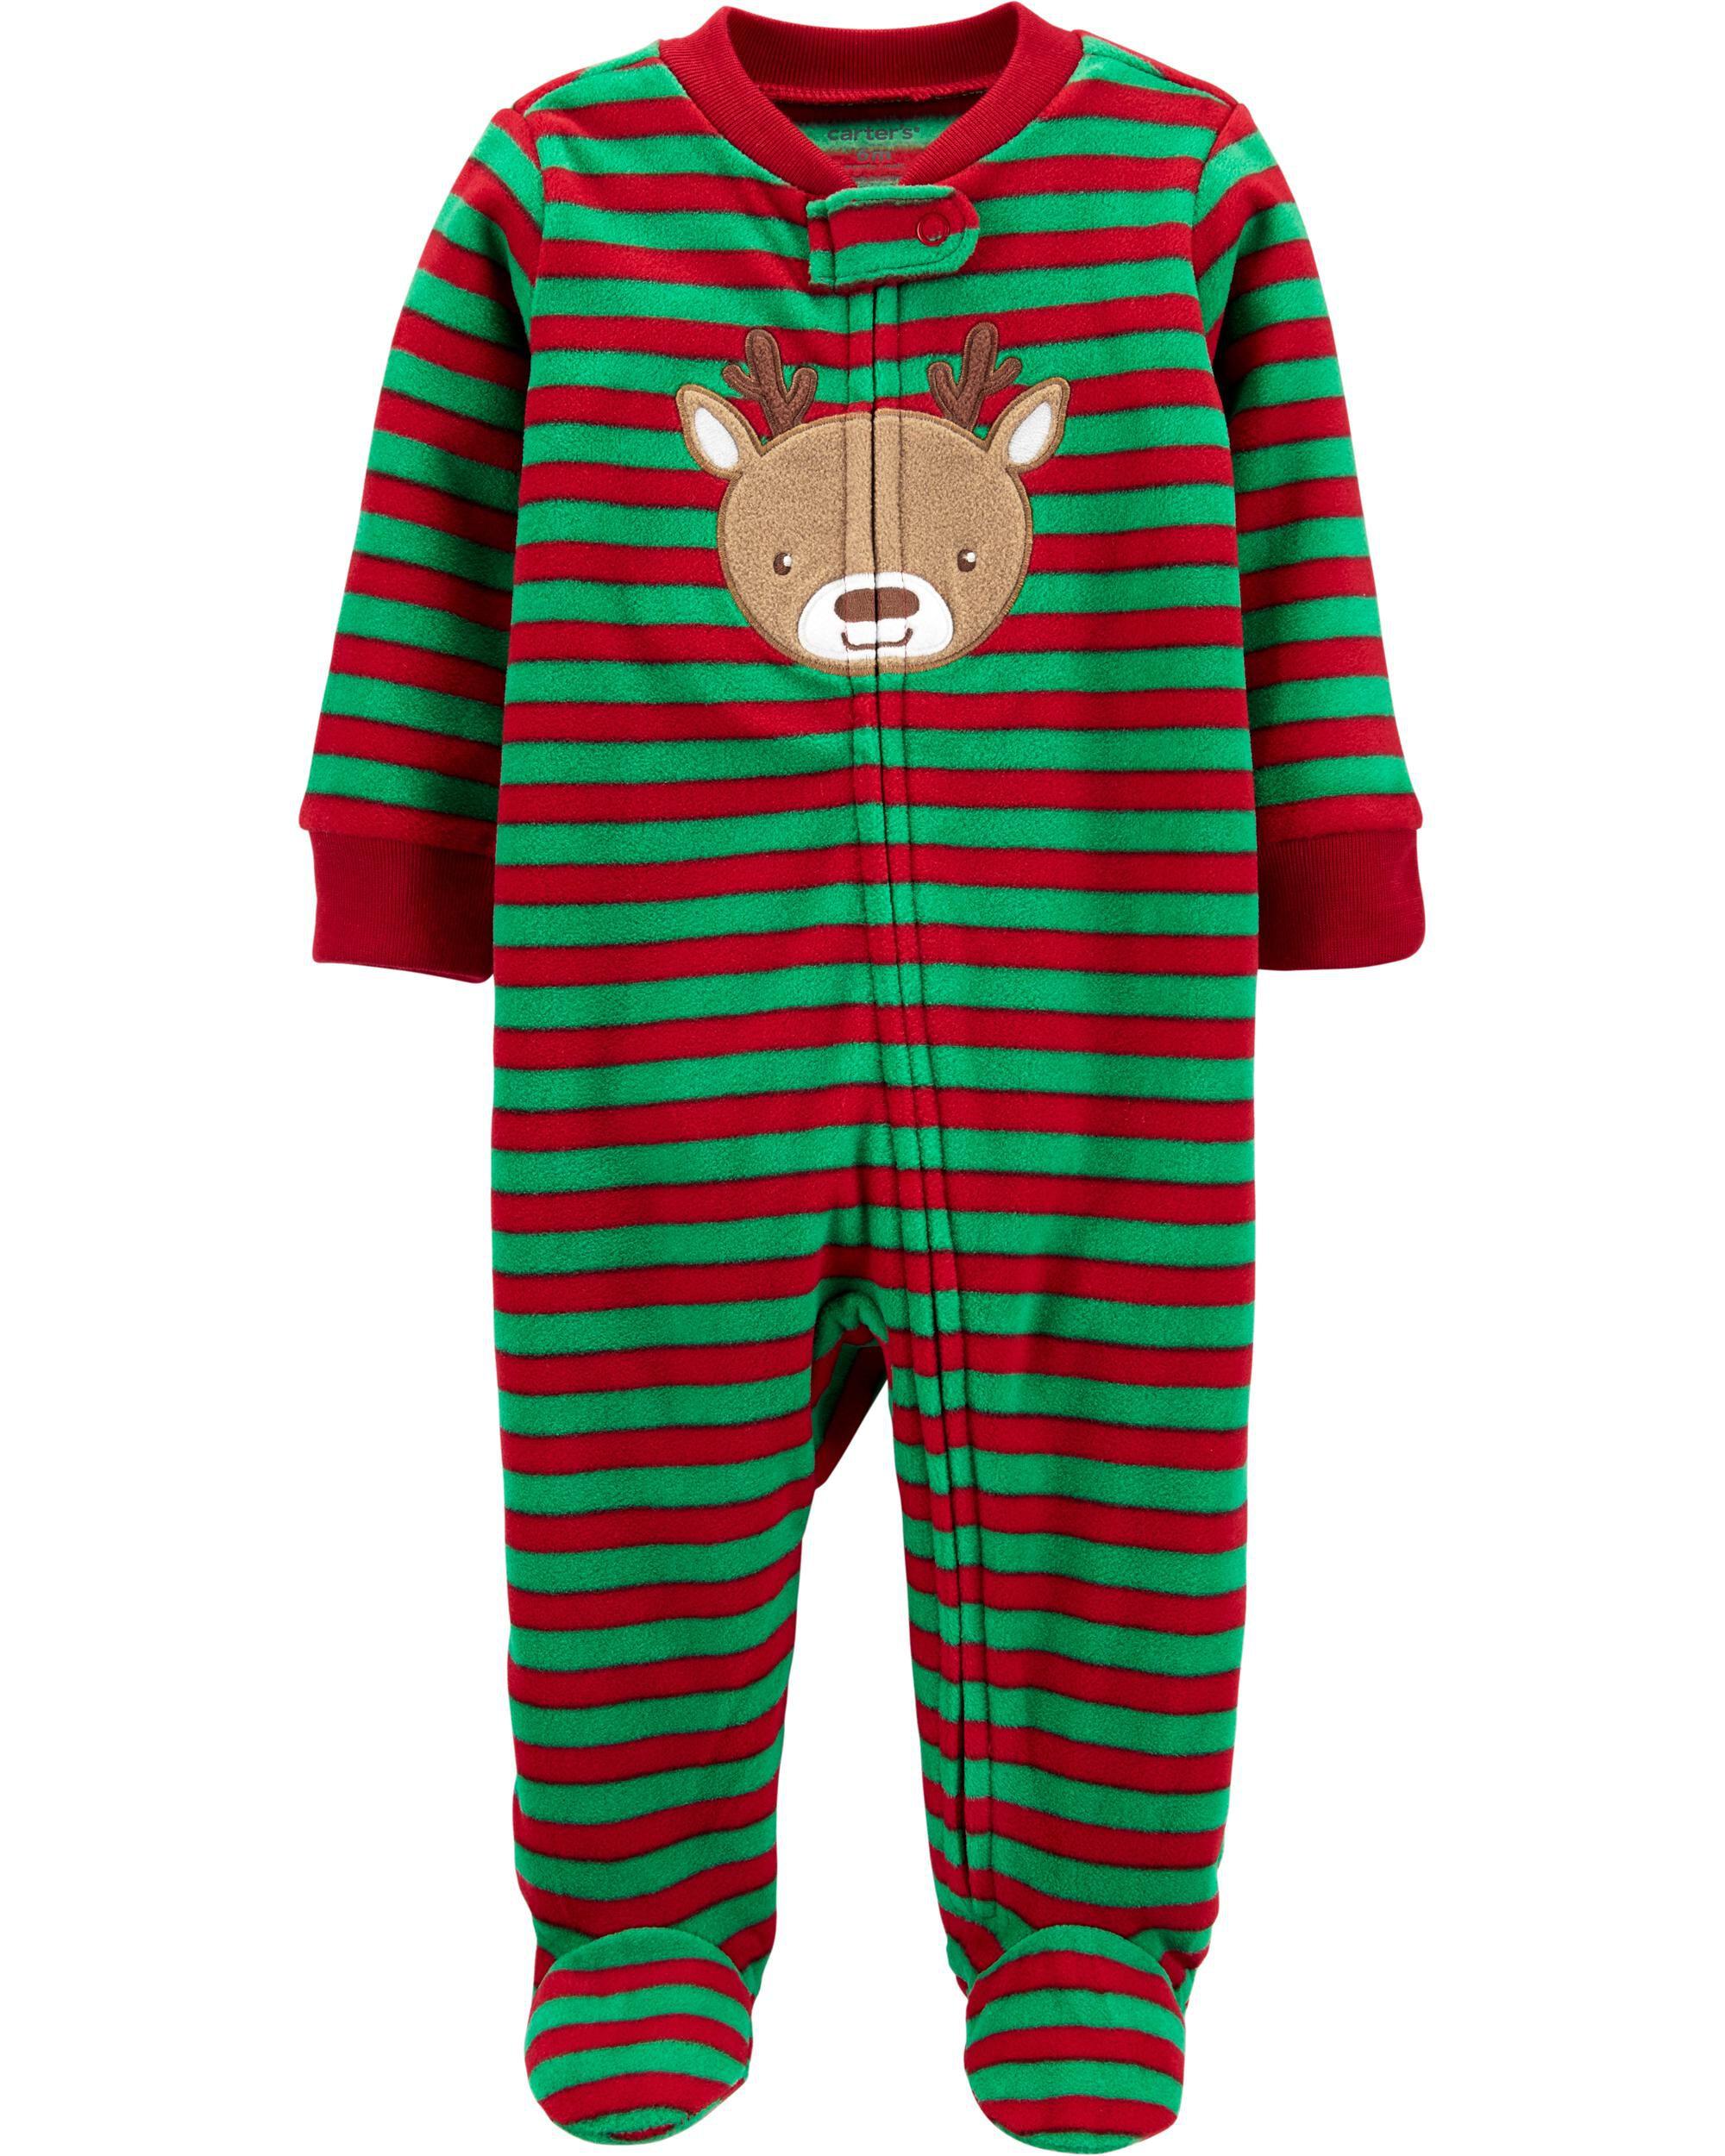 Carters Polyester Fleece One Piece Pajama Zip Front Sleepwear NWT Choice 2T